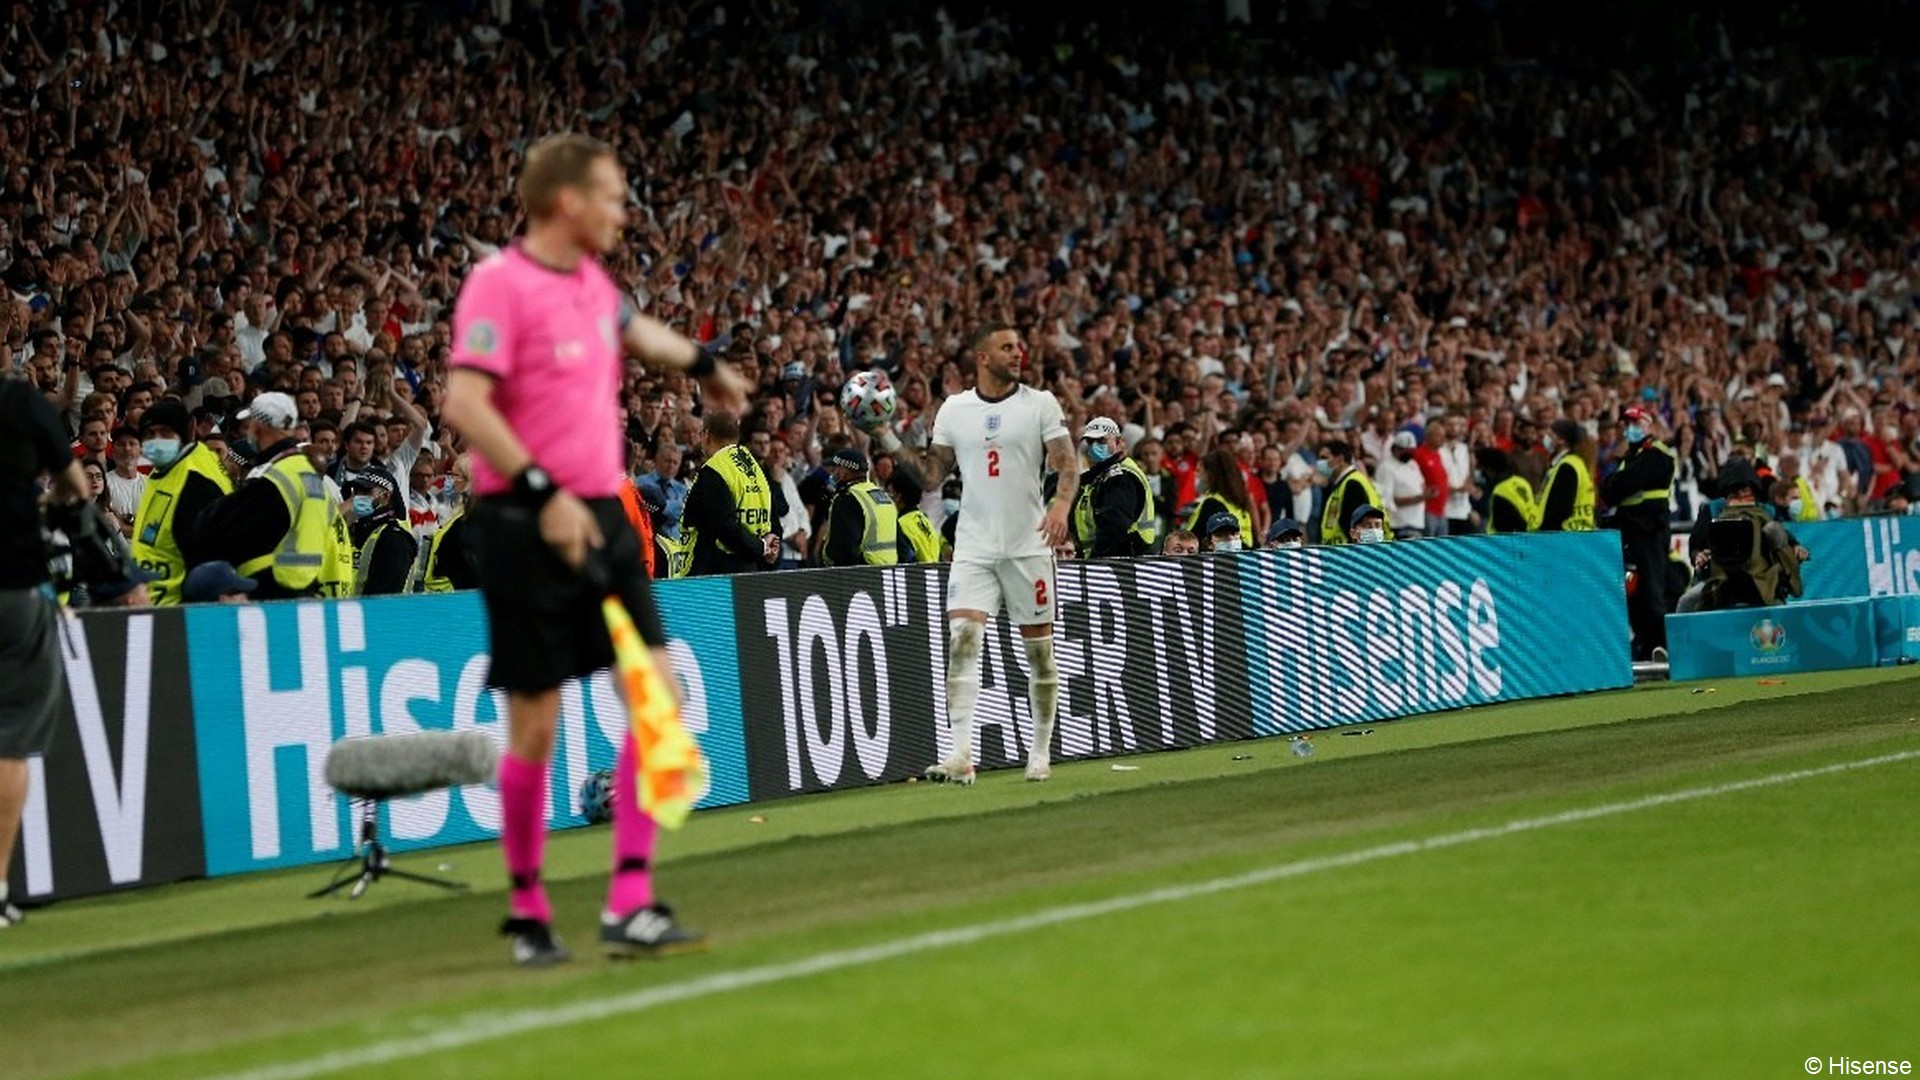 Hisense x Euro 2020 (football) 2021